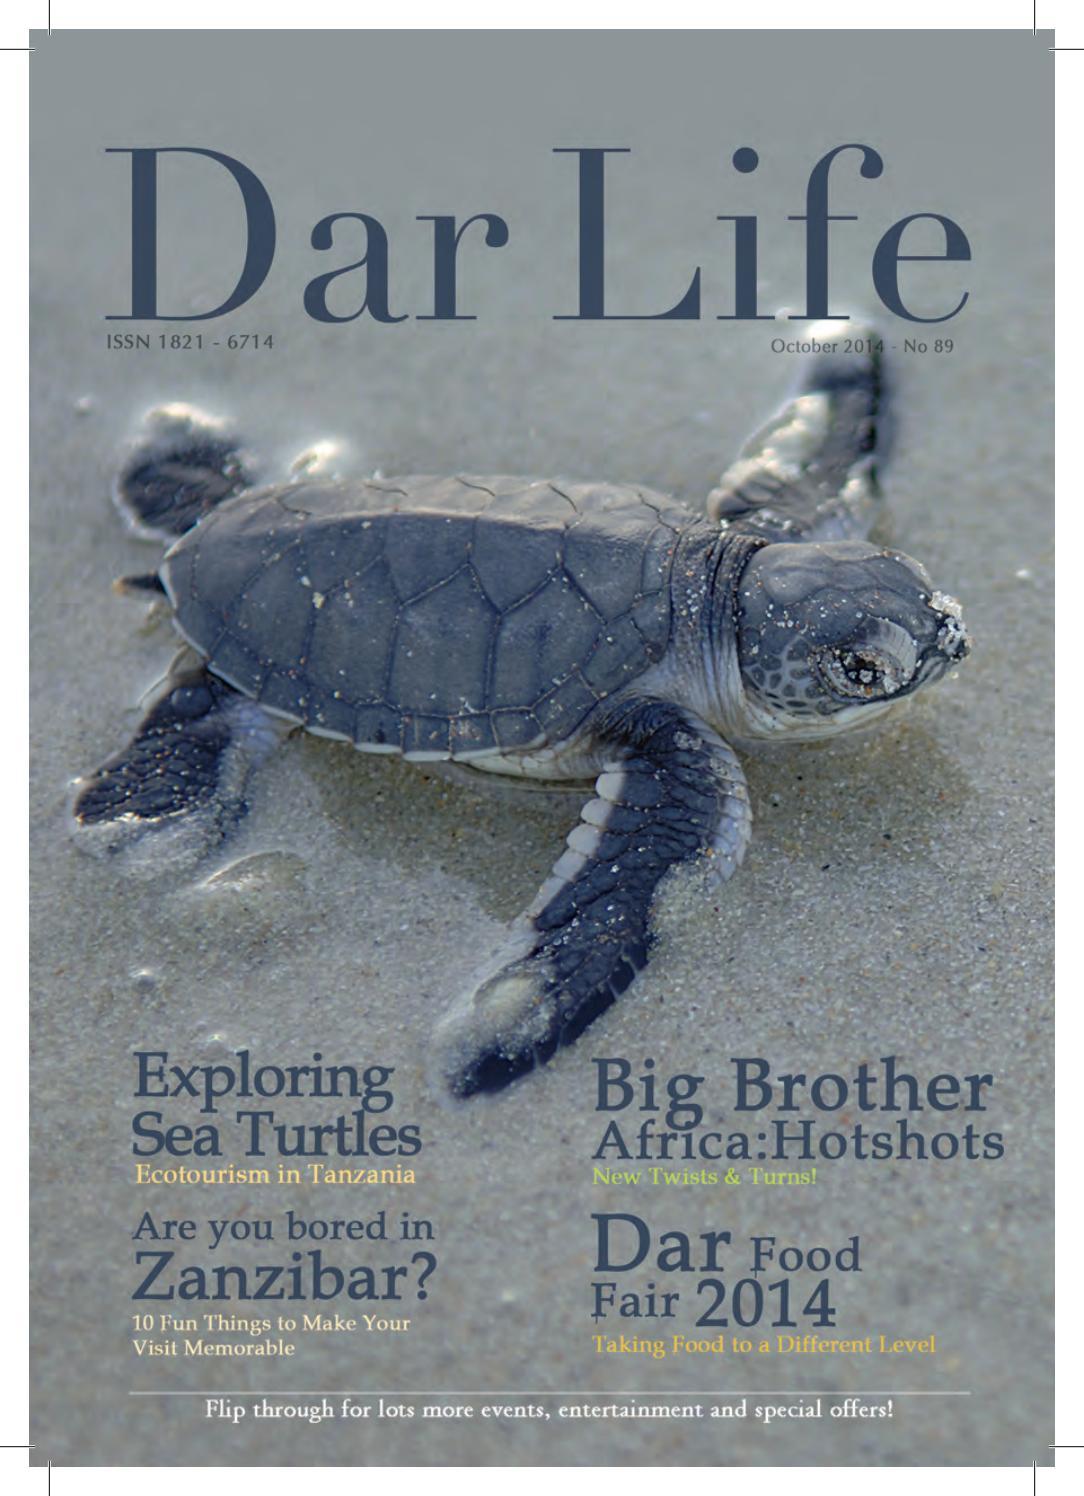 Dar Life October 2014 issue by Dar Life Magazine - issuu